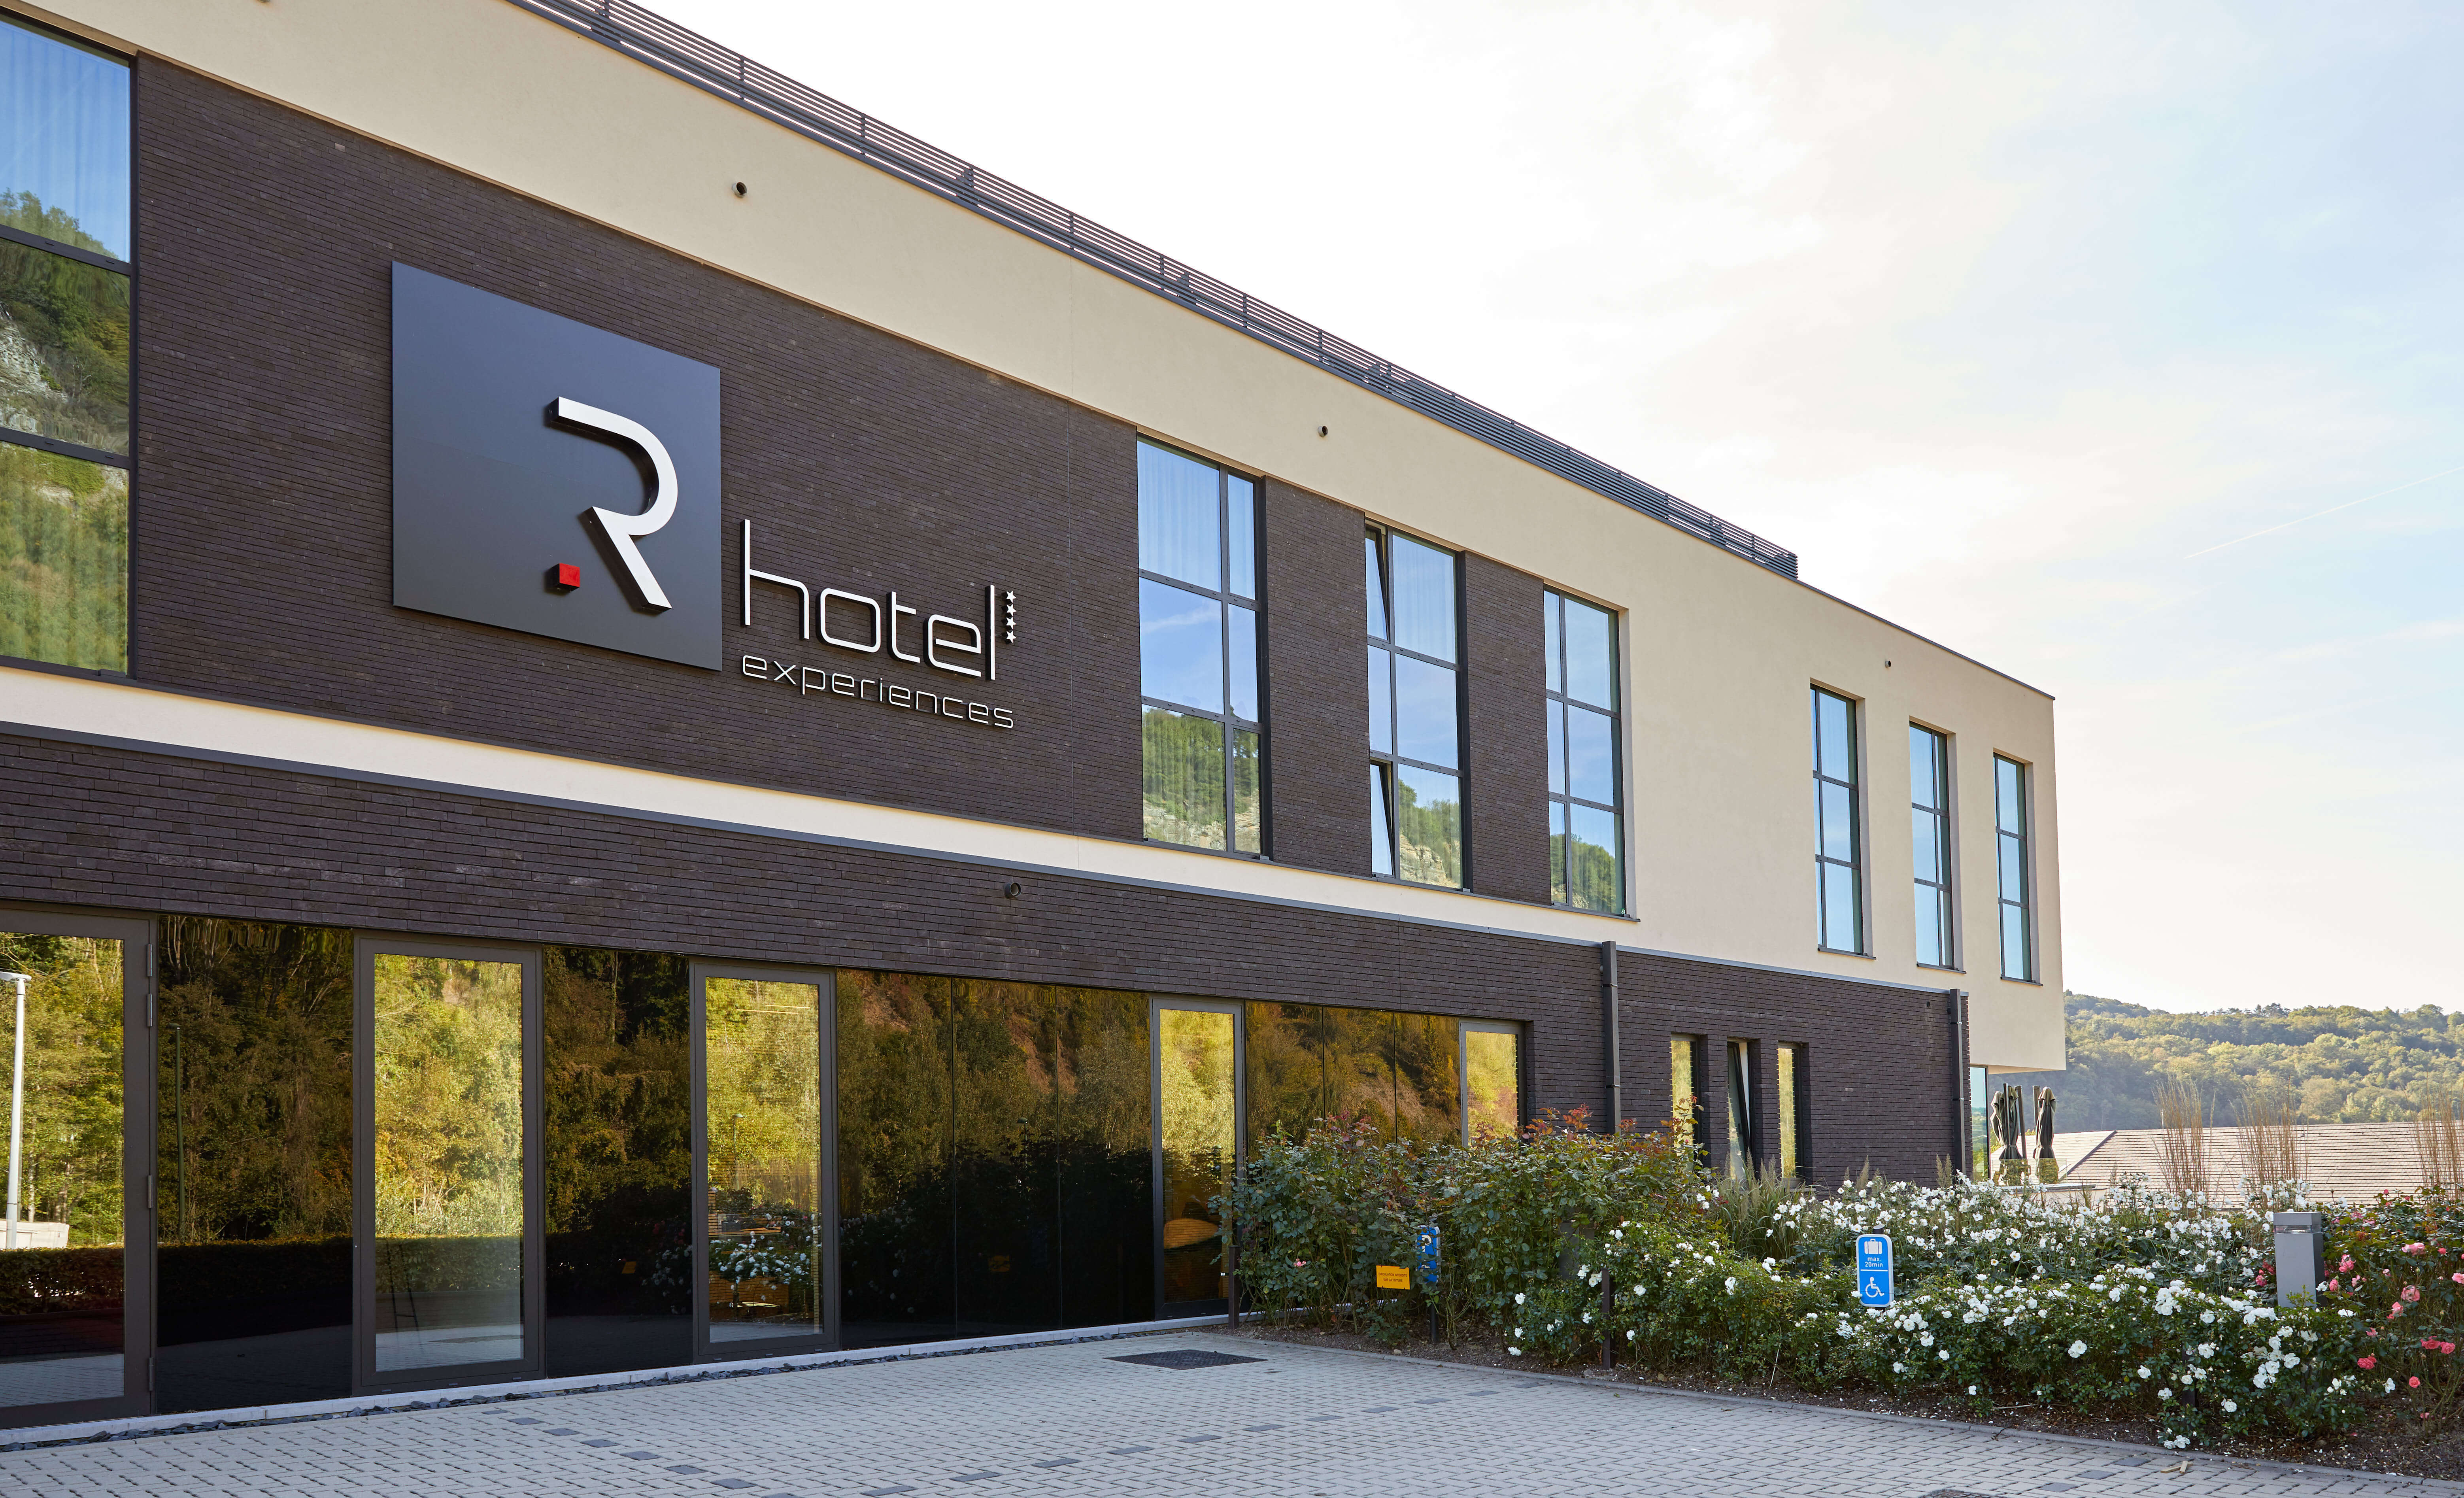 R Hotel Remouchamps Knauf Gevels